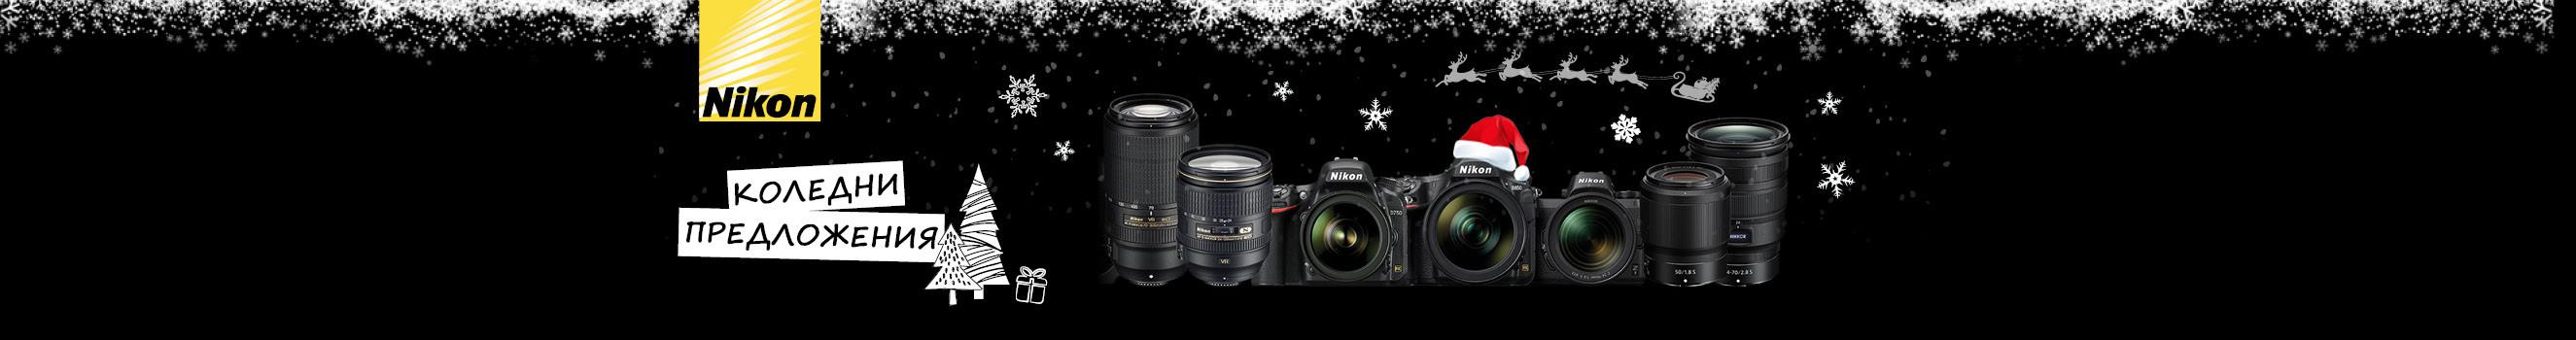 Фотоапарати Nikon, обективи, бинокли, аксесоари на празнични промоционални цени в магазини ФотоСинтезис